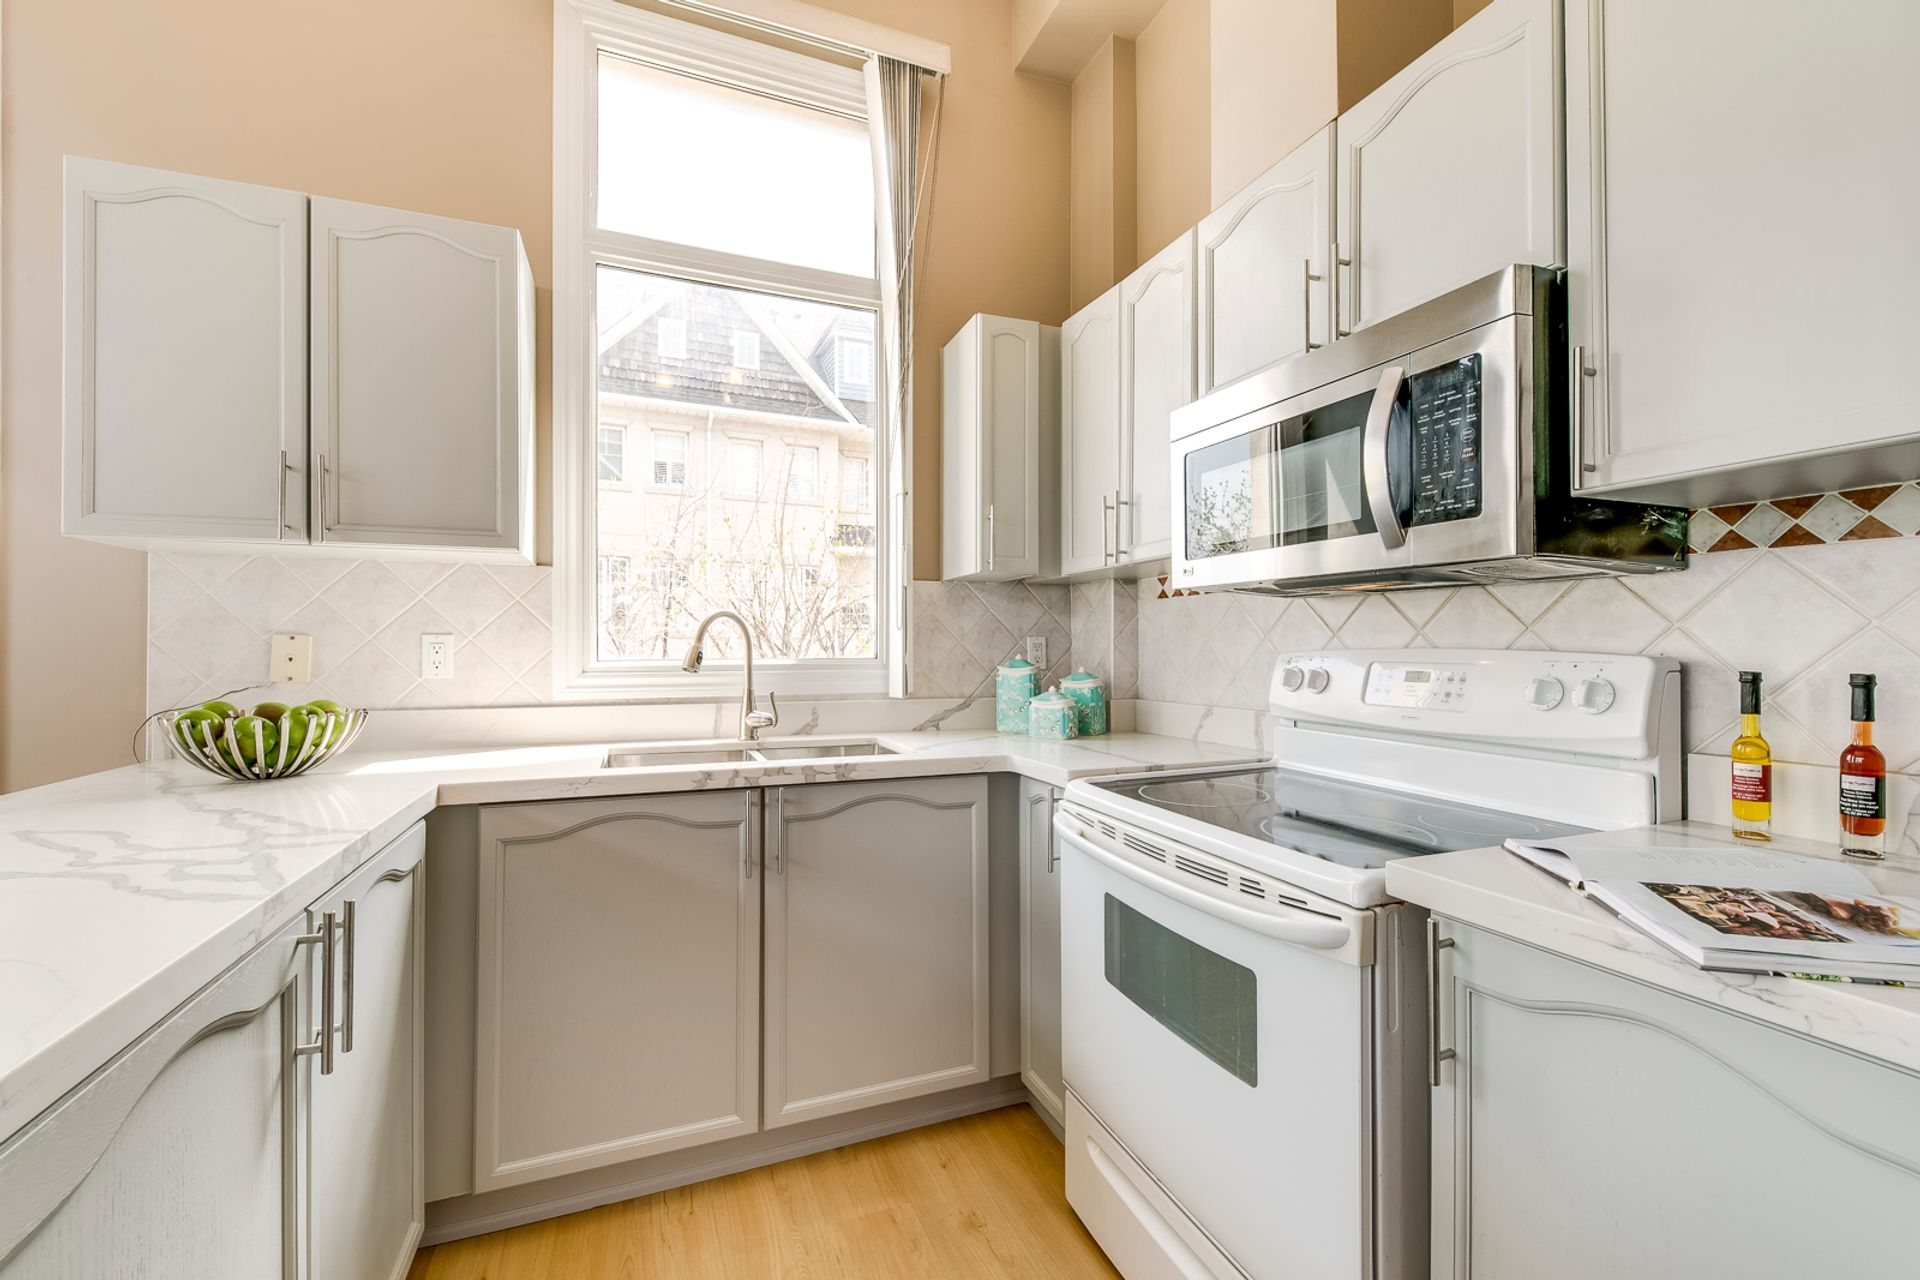 Kitchen - 7 - 840 Dundas St W, Mississauga - Elite3 & Team at 7 - 840 Dundas Street W, Erindale, Mississauga